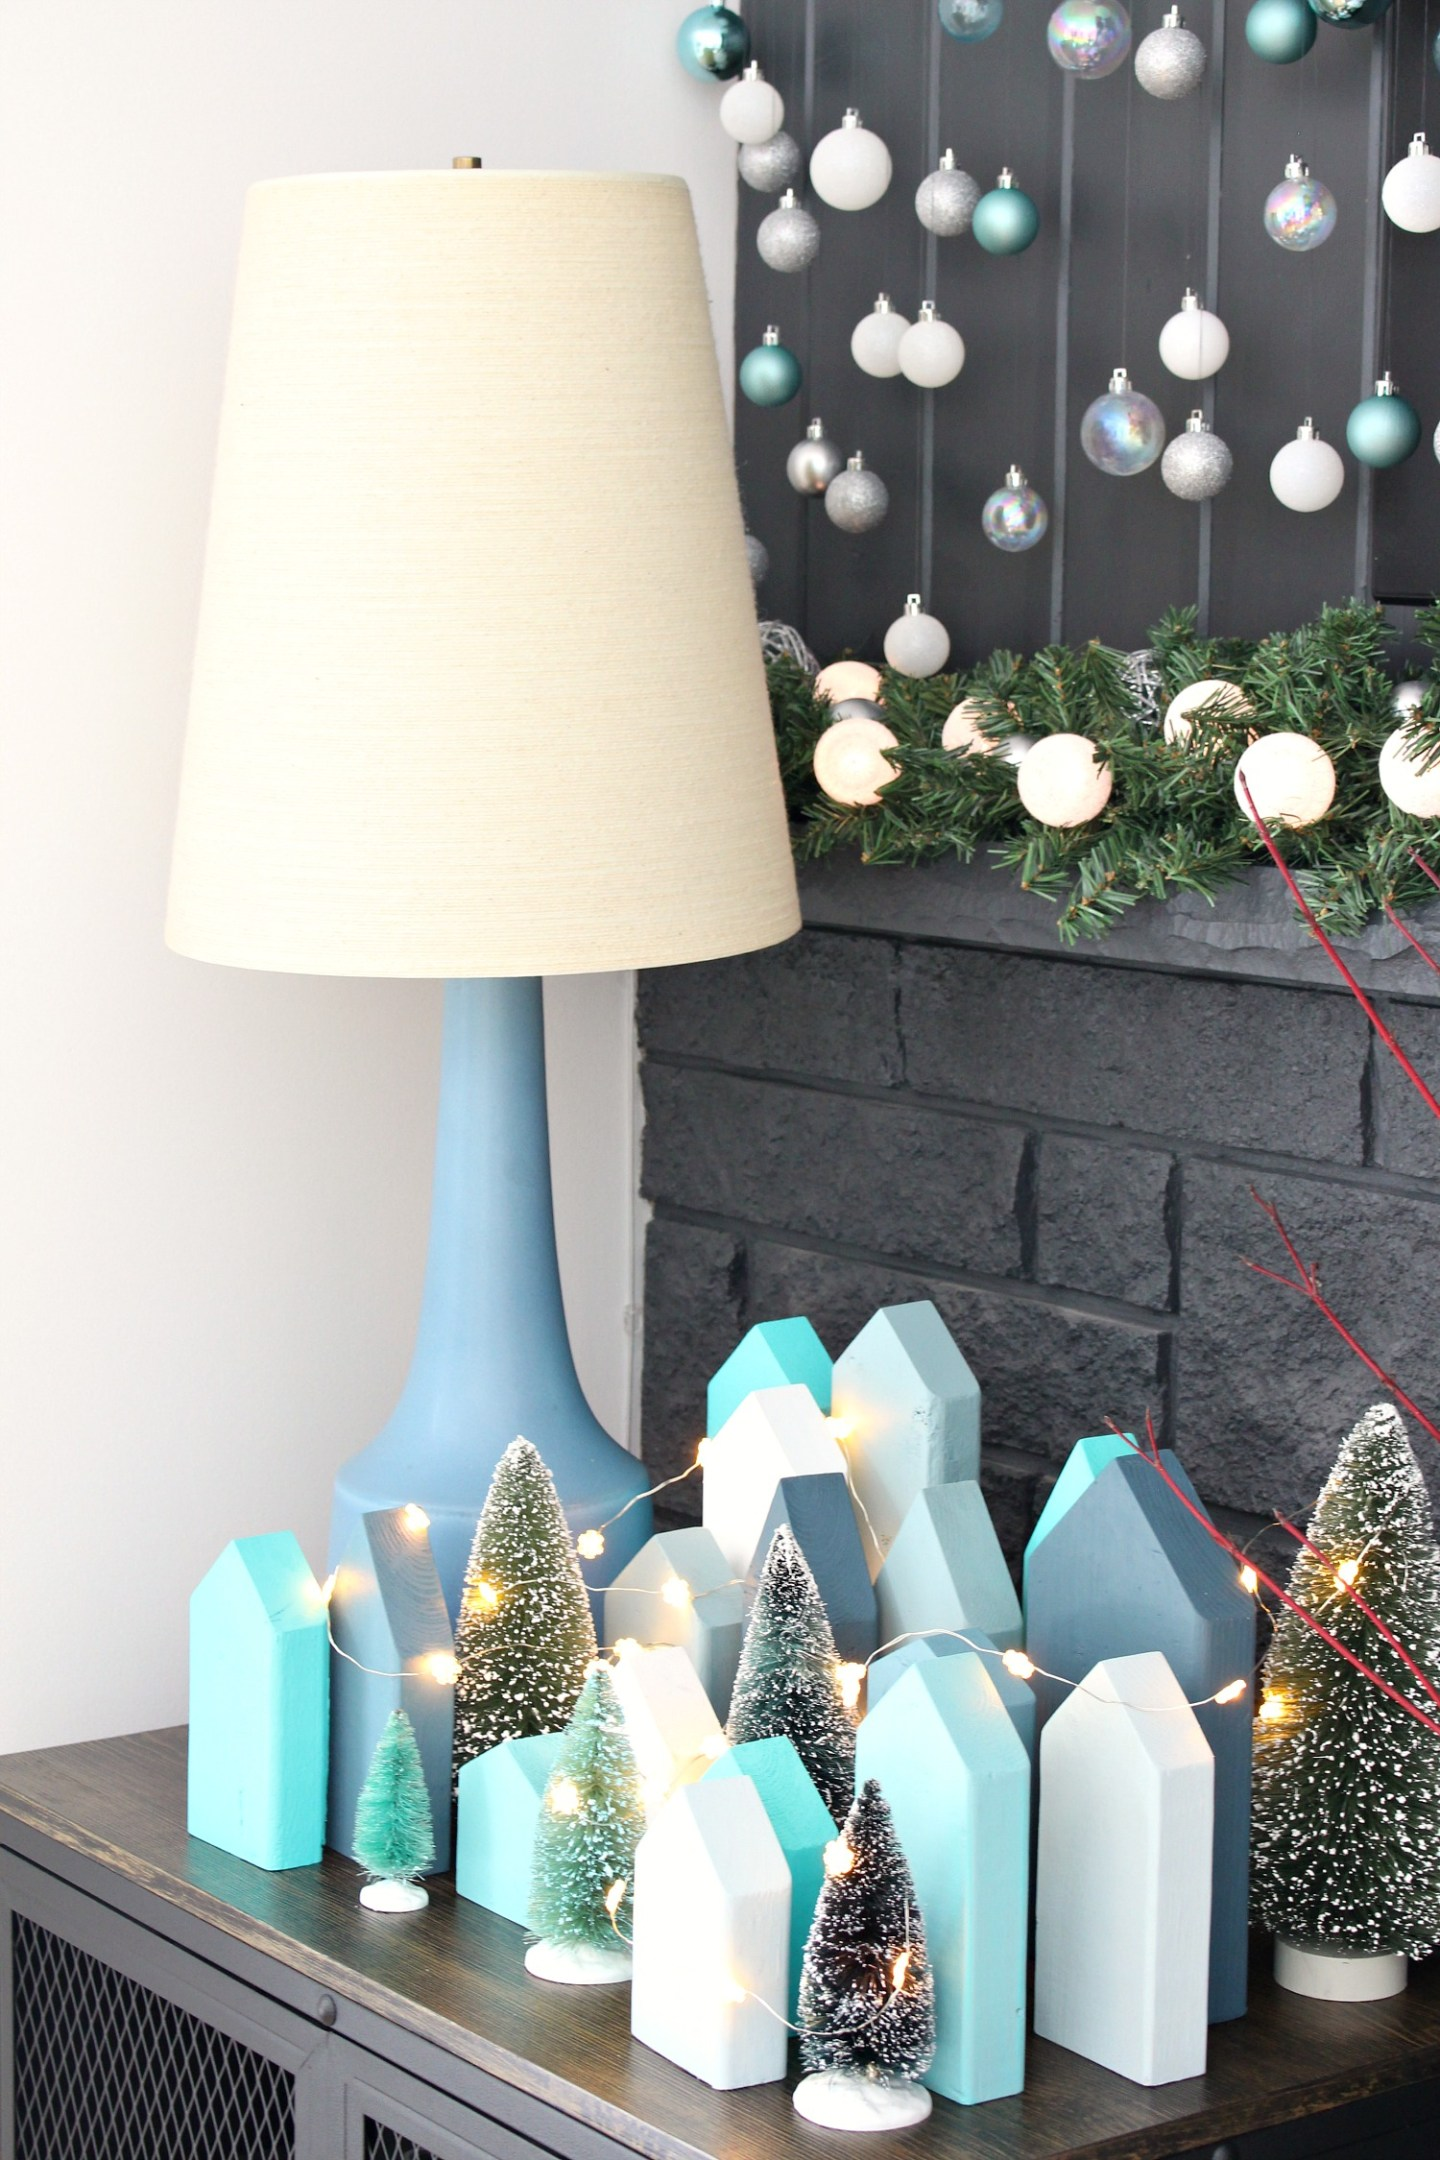 DIY Holiday Village Tutorial